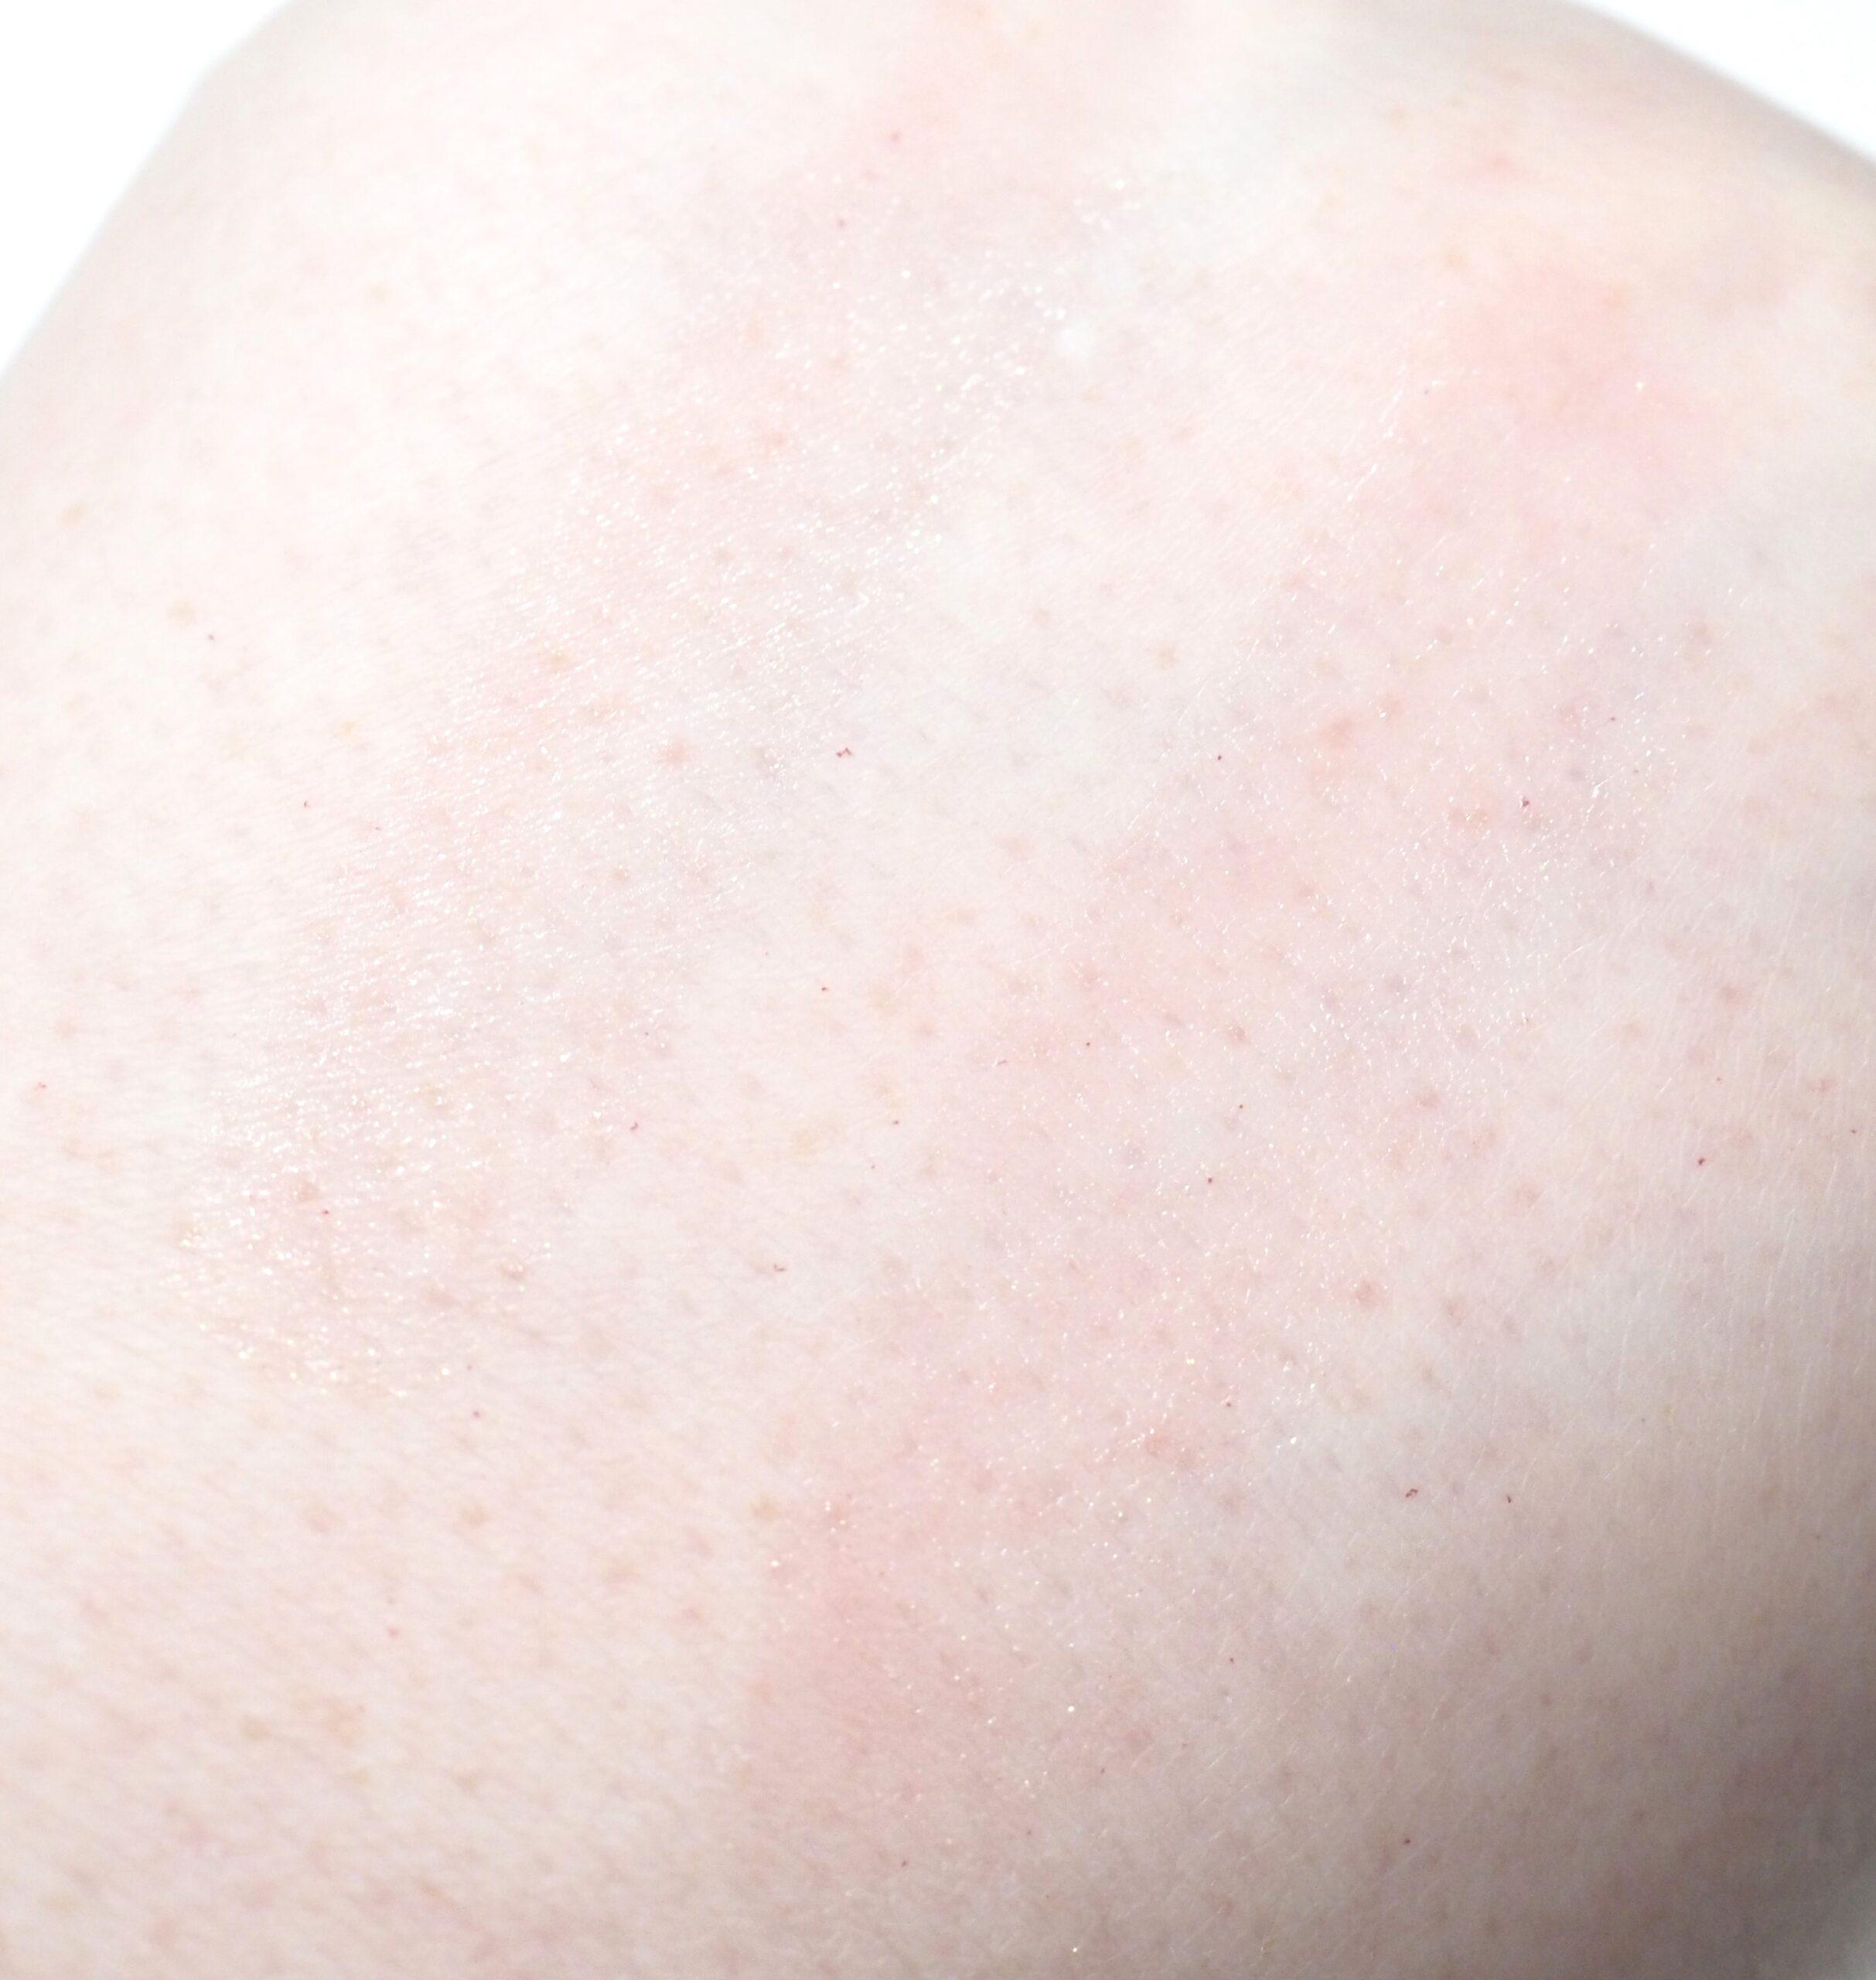 Jeffree Star Cosmetics Hydrating Glitz Lip Balm Review / Swatches